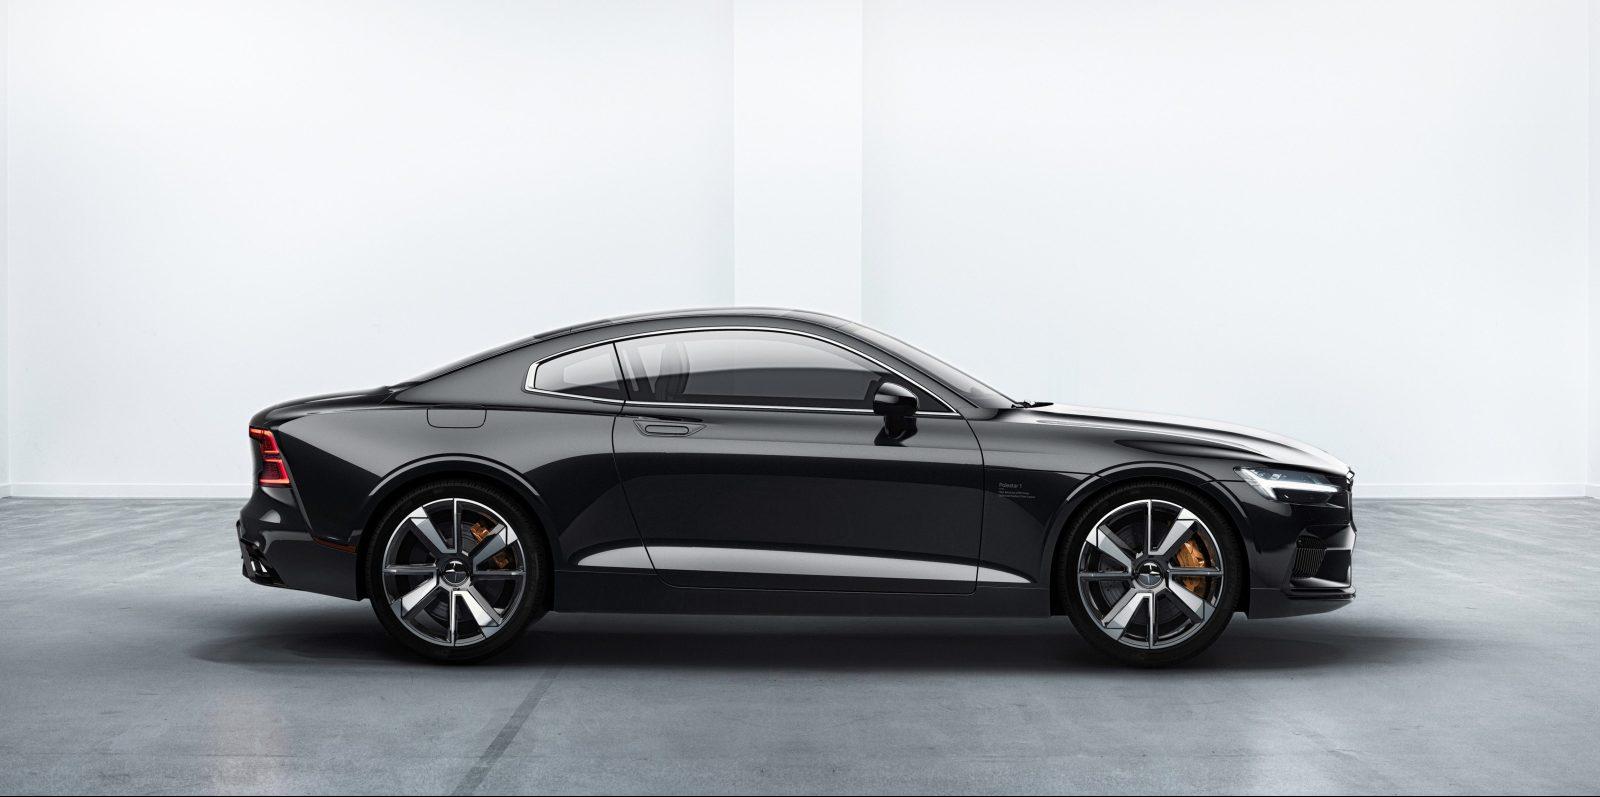 Volvo S Polestar Unveils Performance Electric Car Announces New Tesla Model 3 Compeor